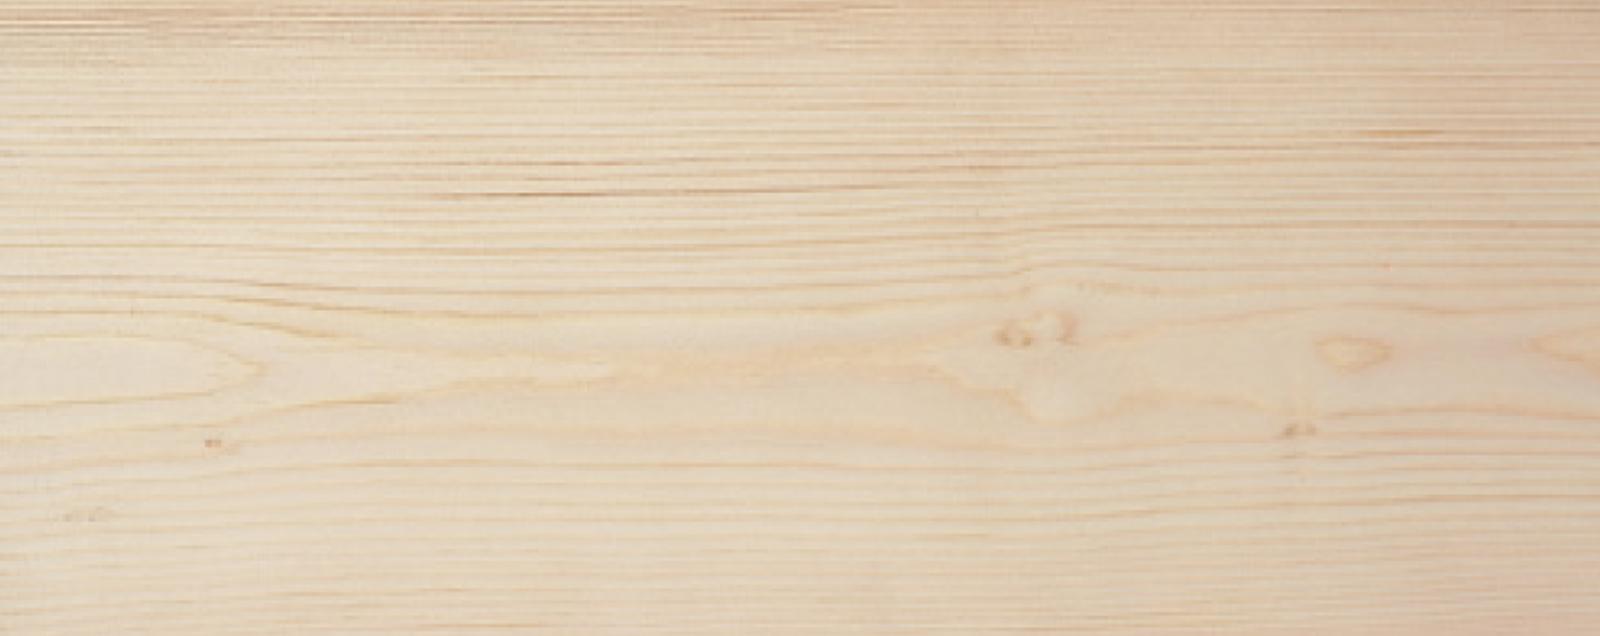 Maderas con feras pino rojo maderas chapar for Bar de madera de pino